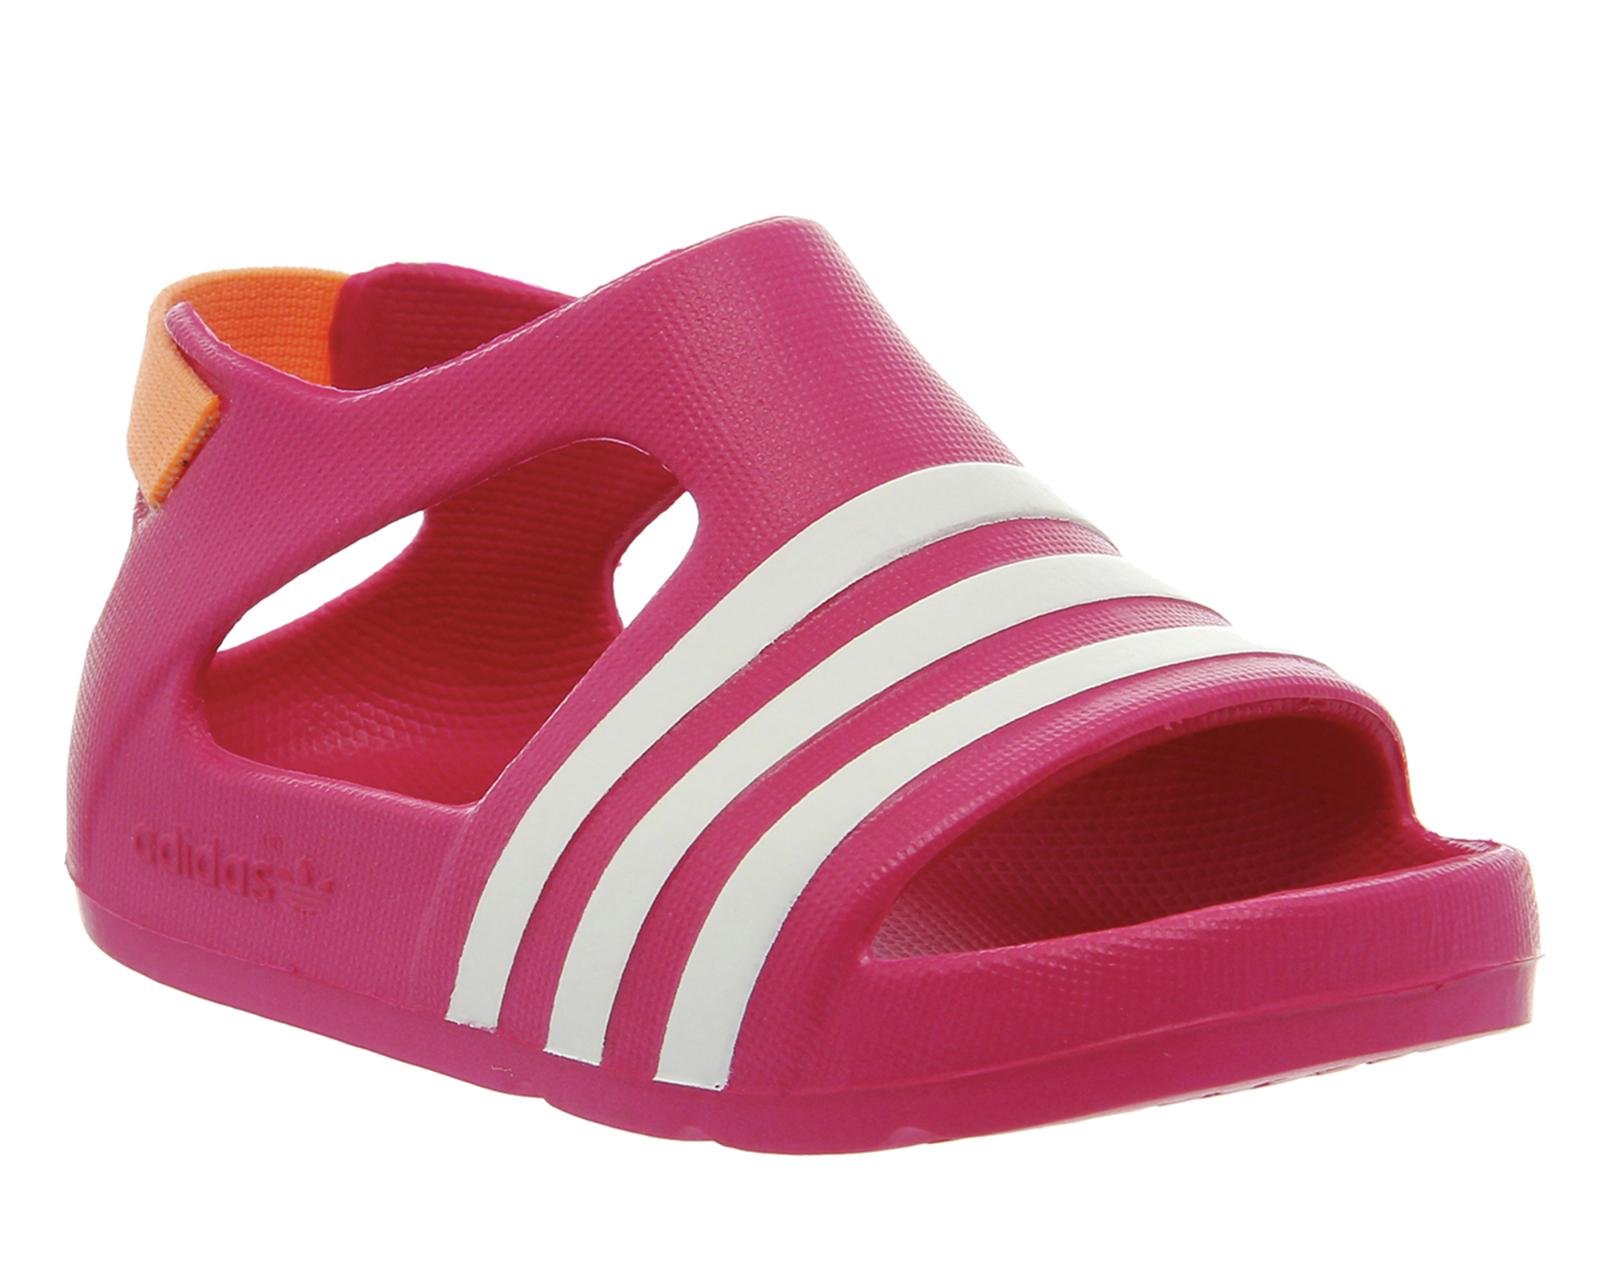 Infant Minnie Mouse Nike Shoes